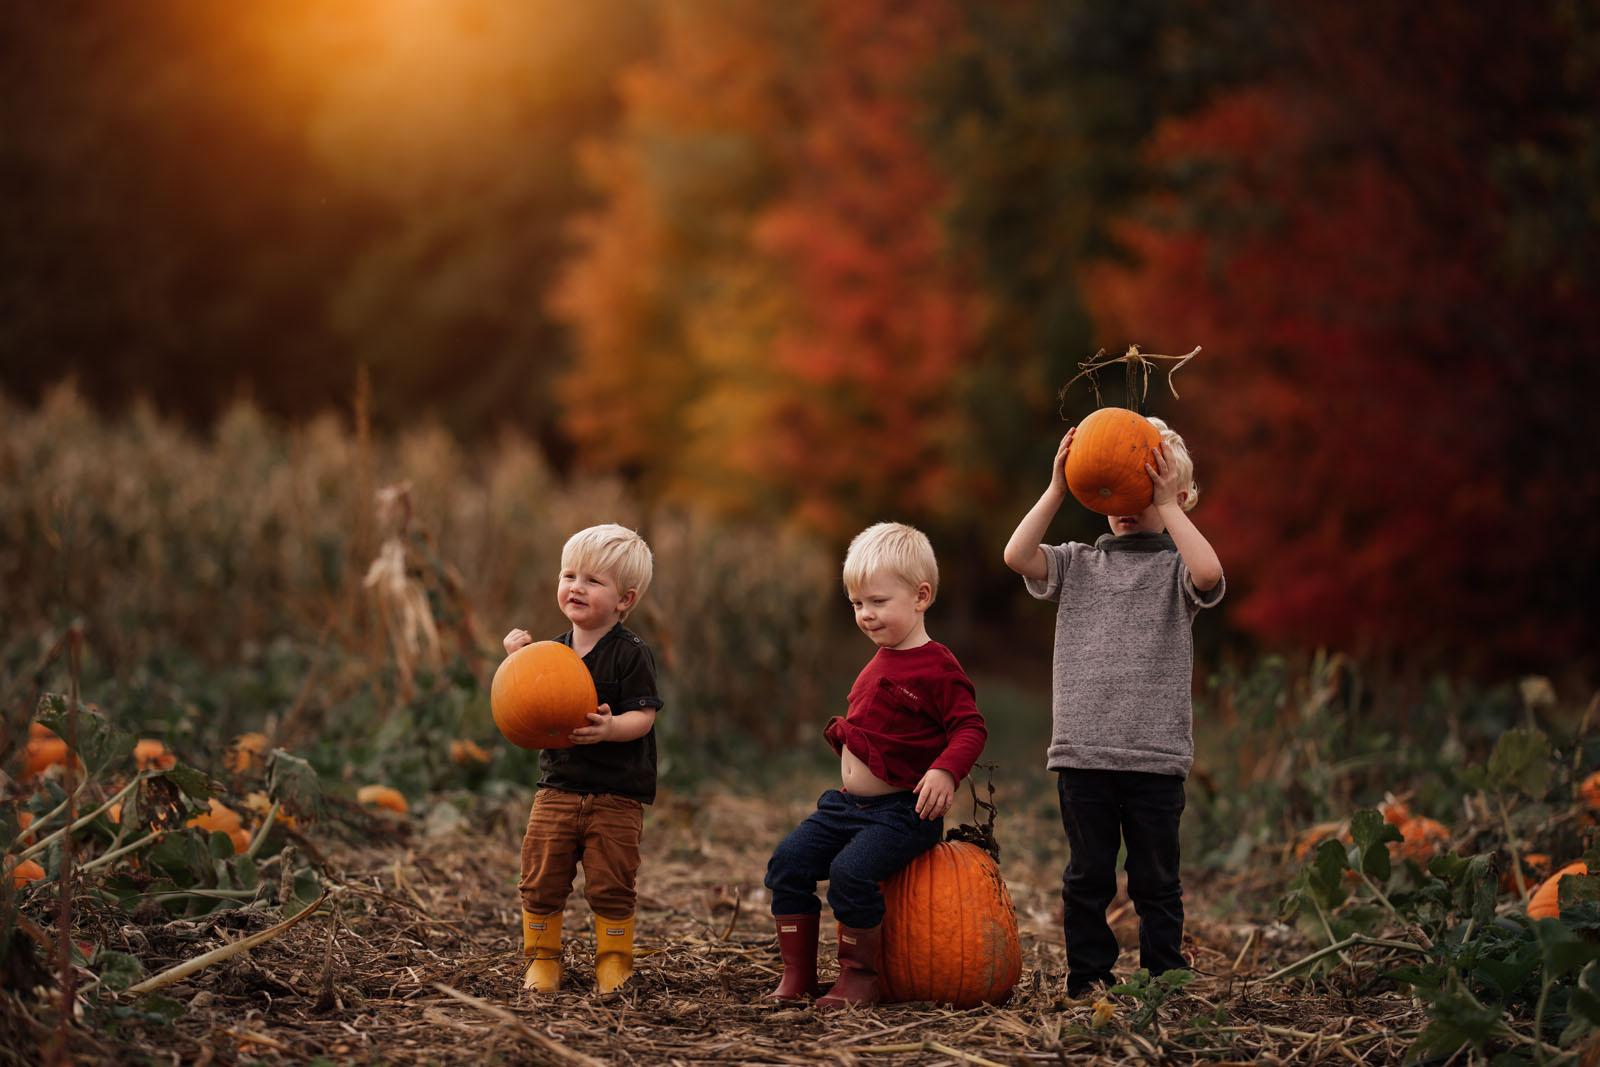 megloeks_image4 three small children at pumpkin patch holding pumpkins fall activities by meg loeks